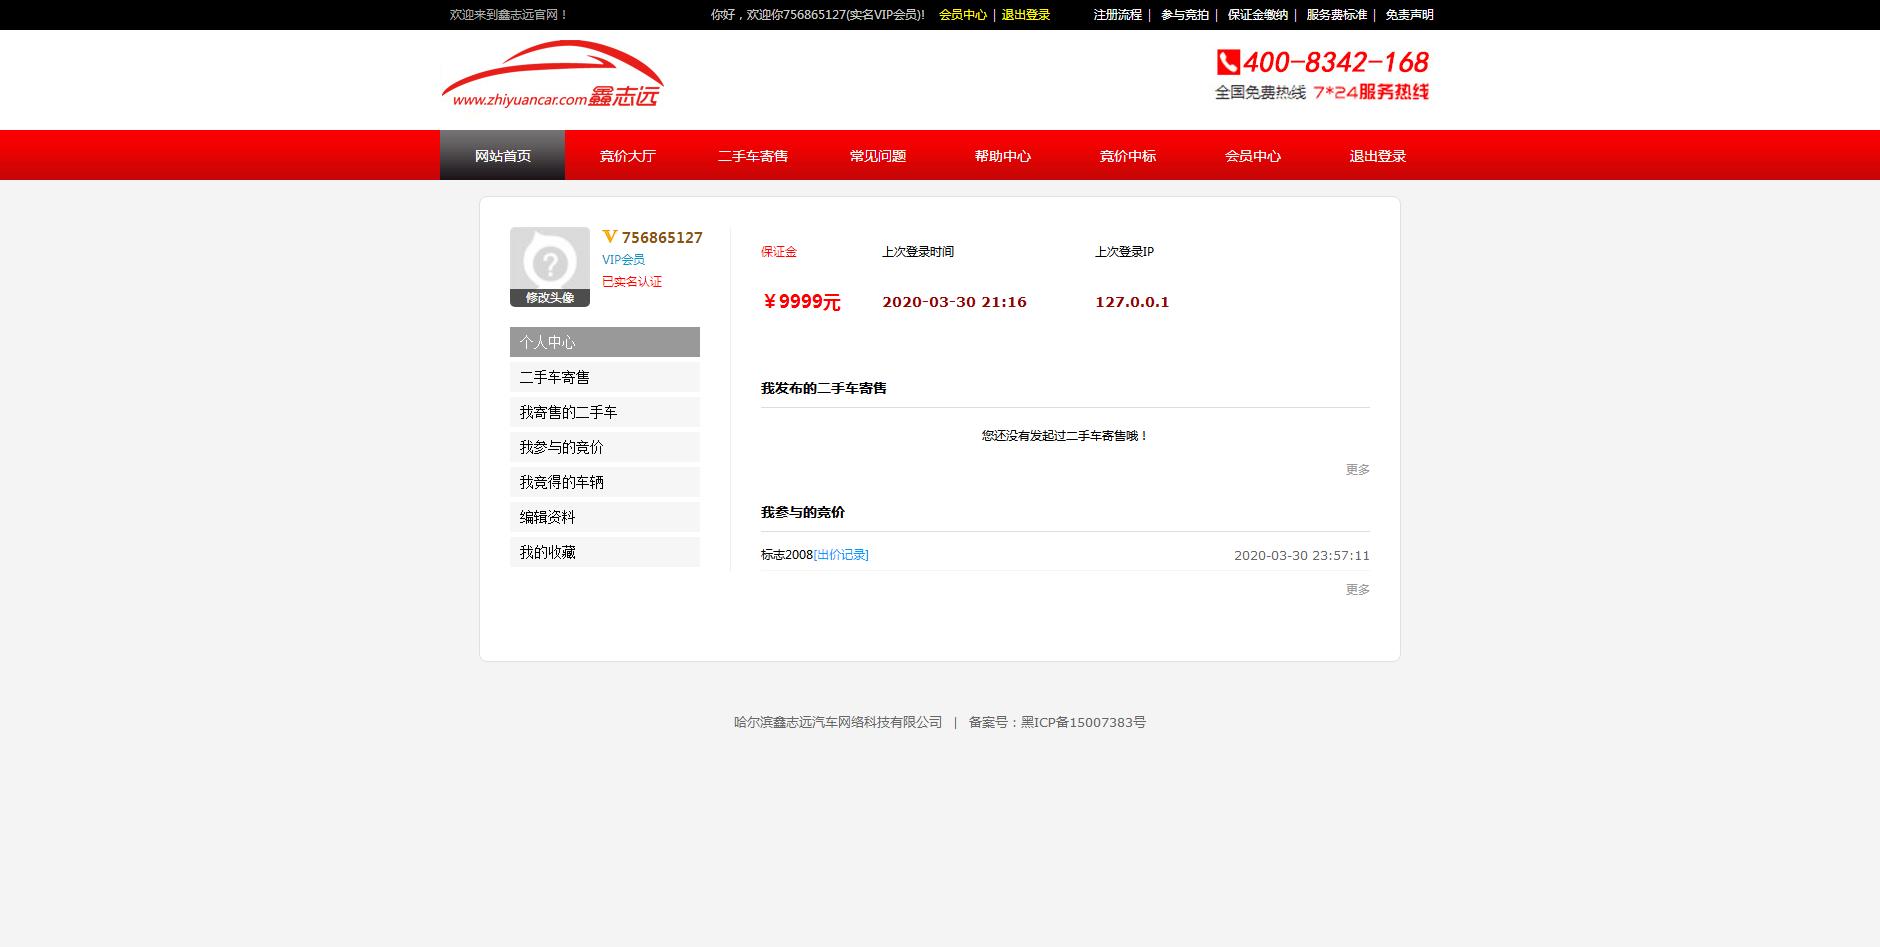 PHP汽车二手车拍卖网站源码 事故车竞拍拍卖系统-闲人源码